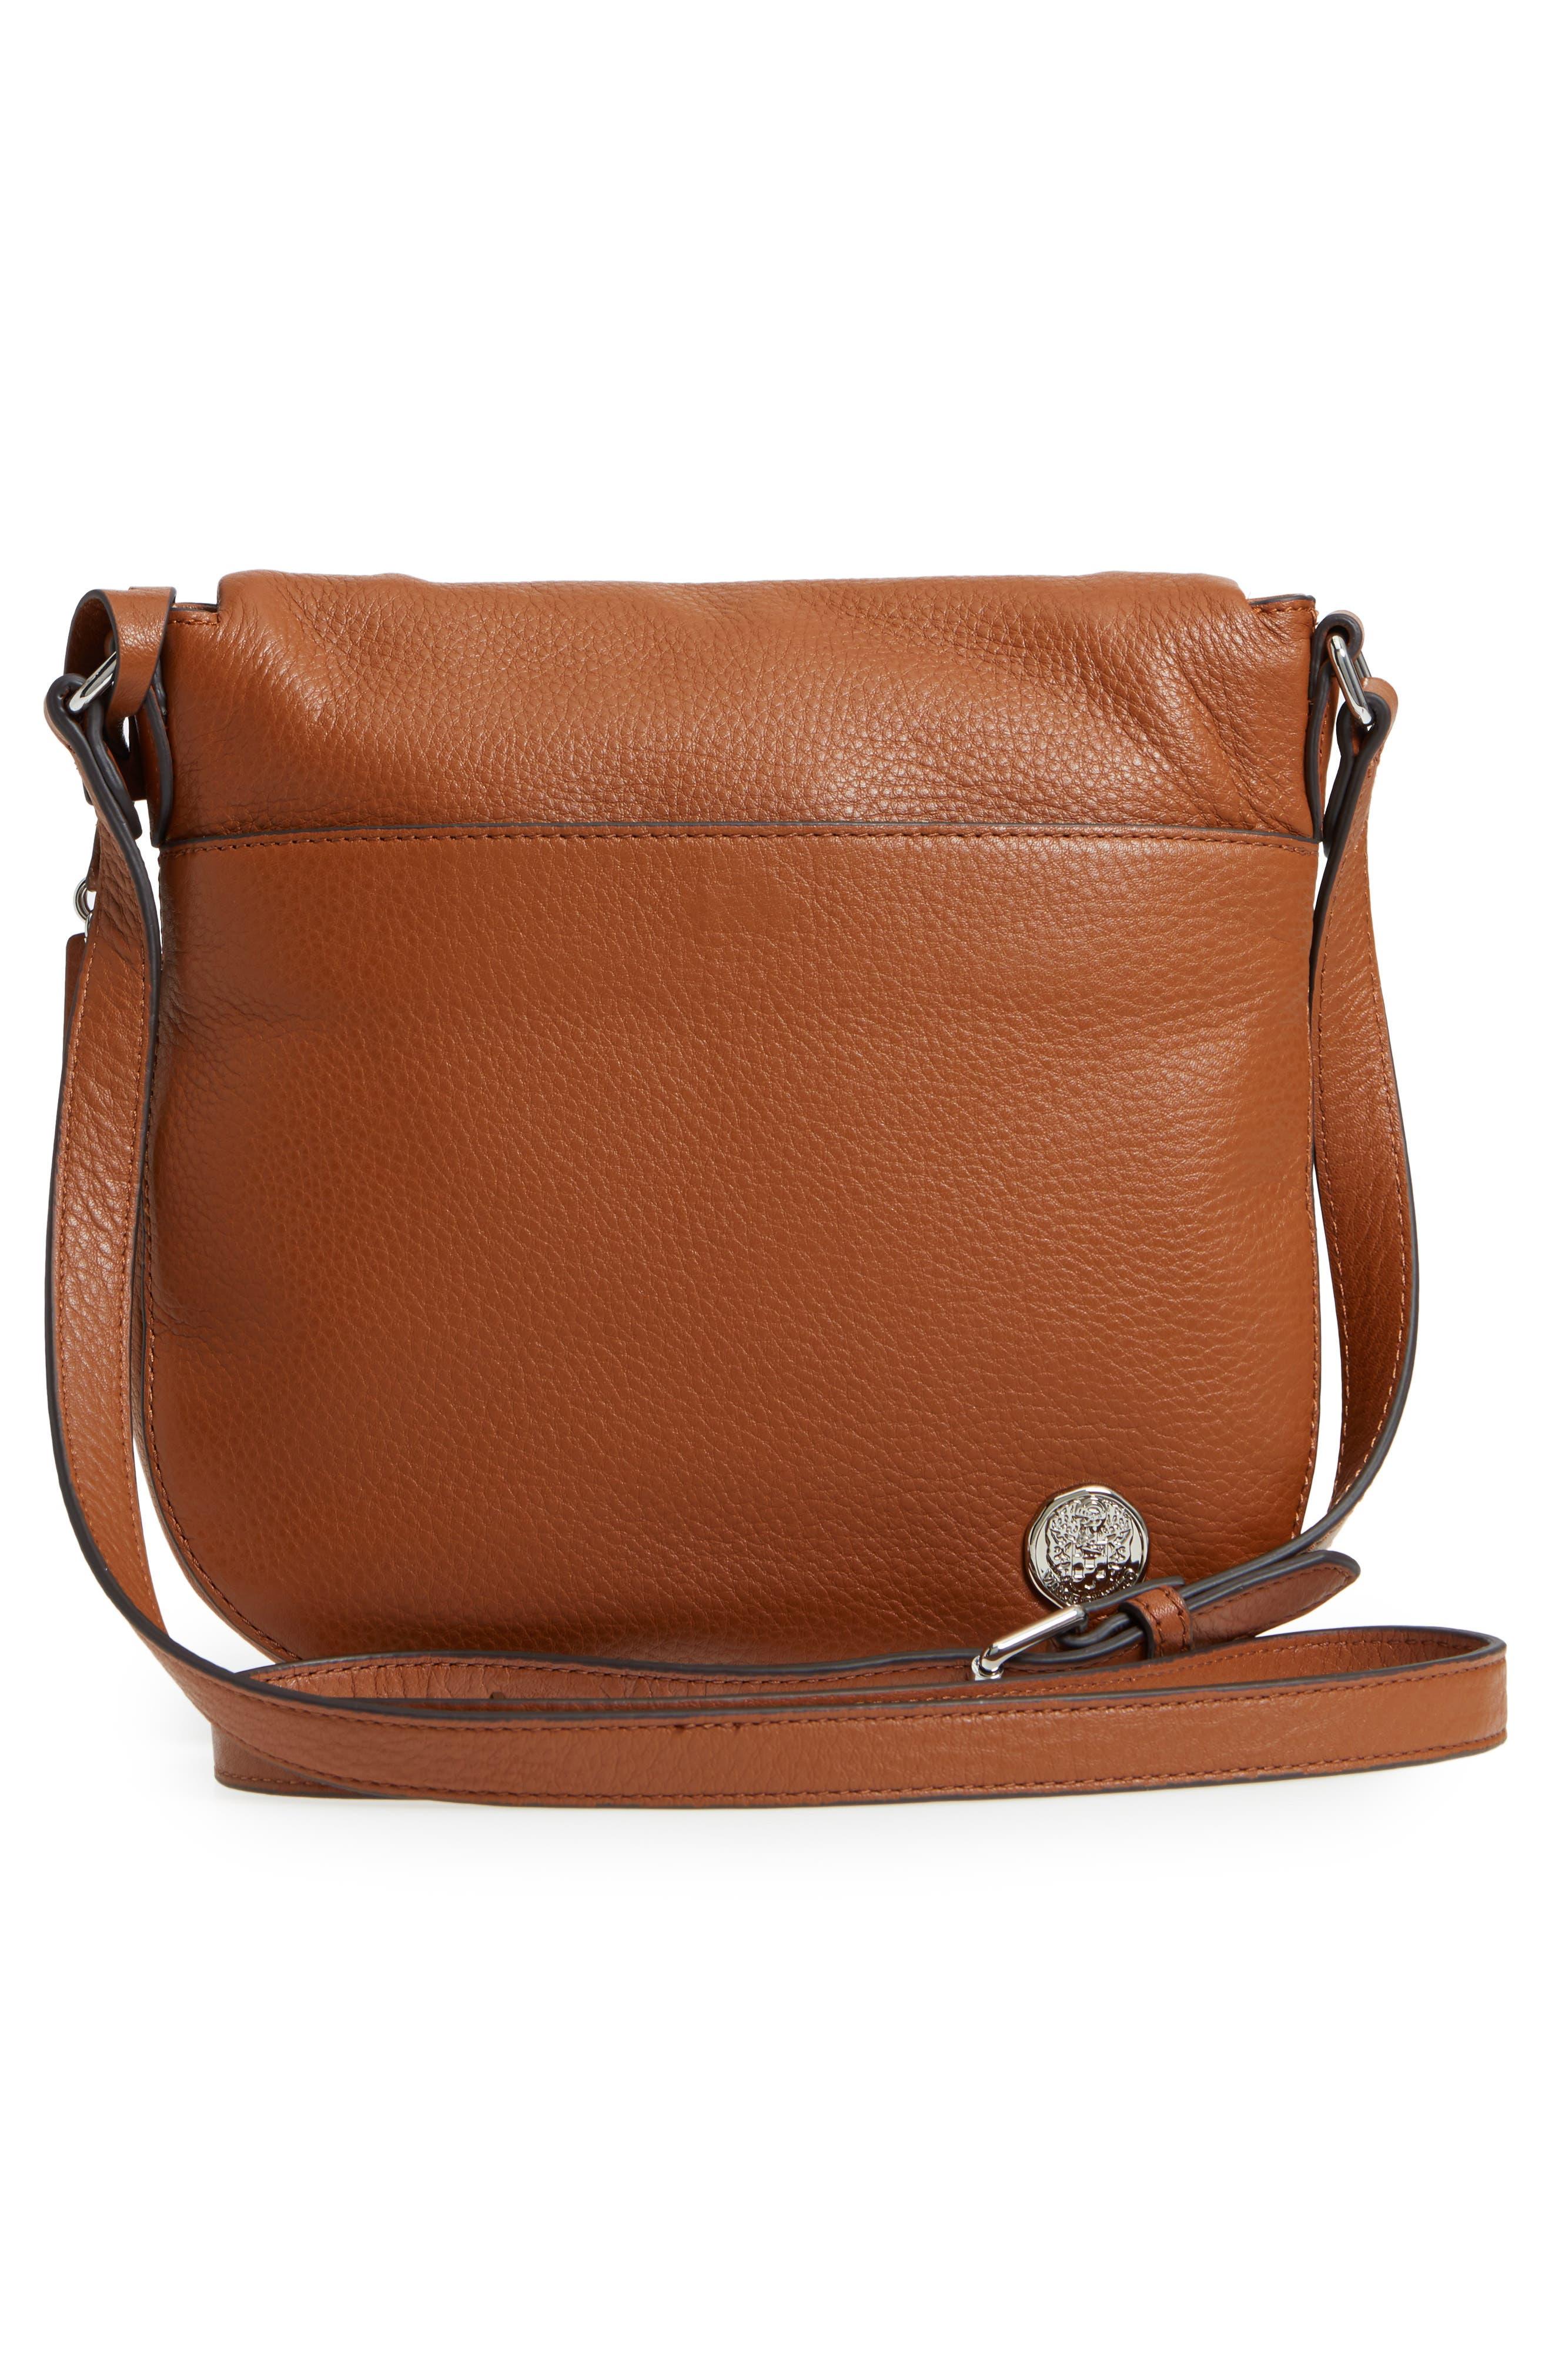 'Tala' Leather Crossbody Bag,                             Alternate thumbnail 3, color,                             203